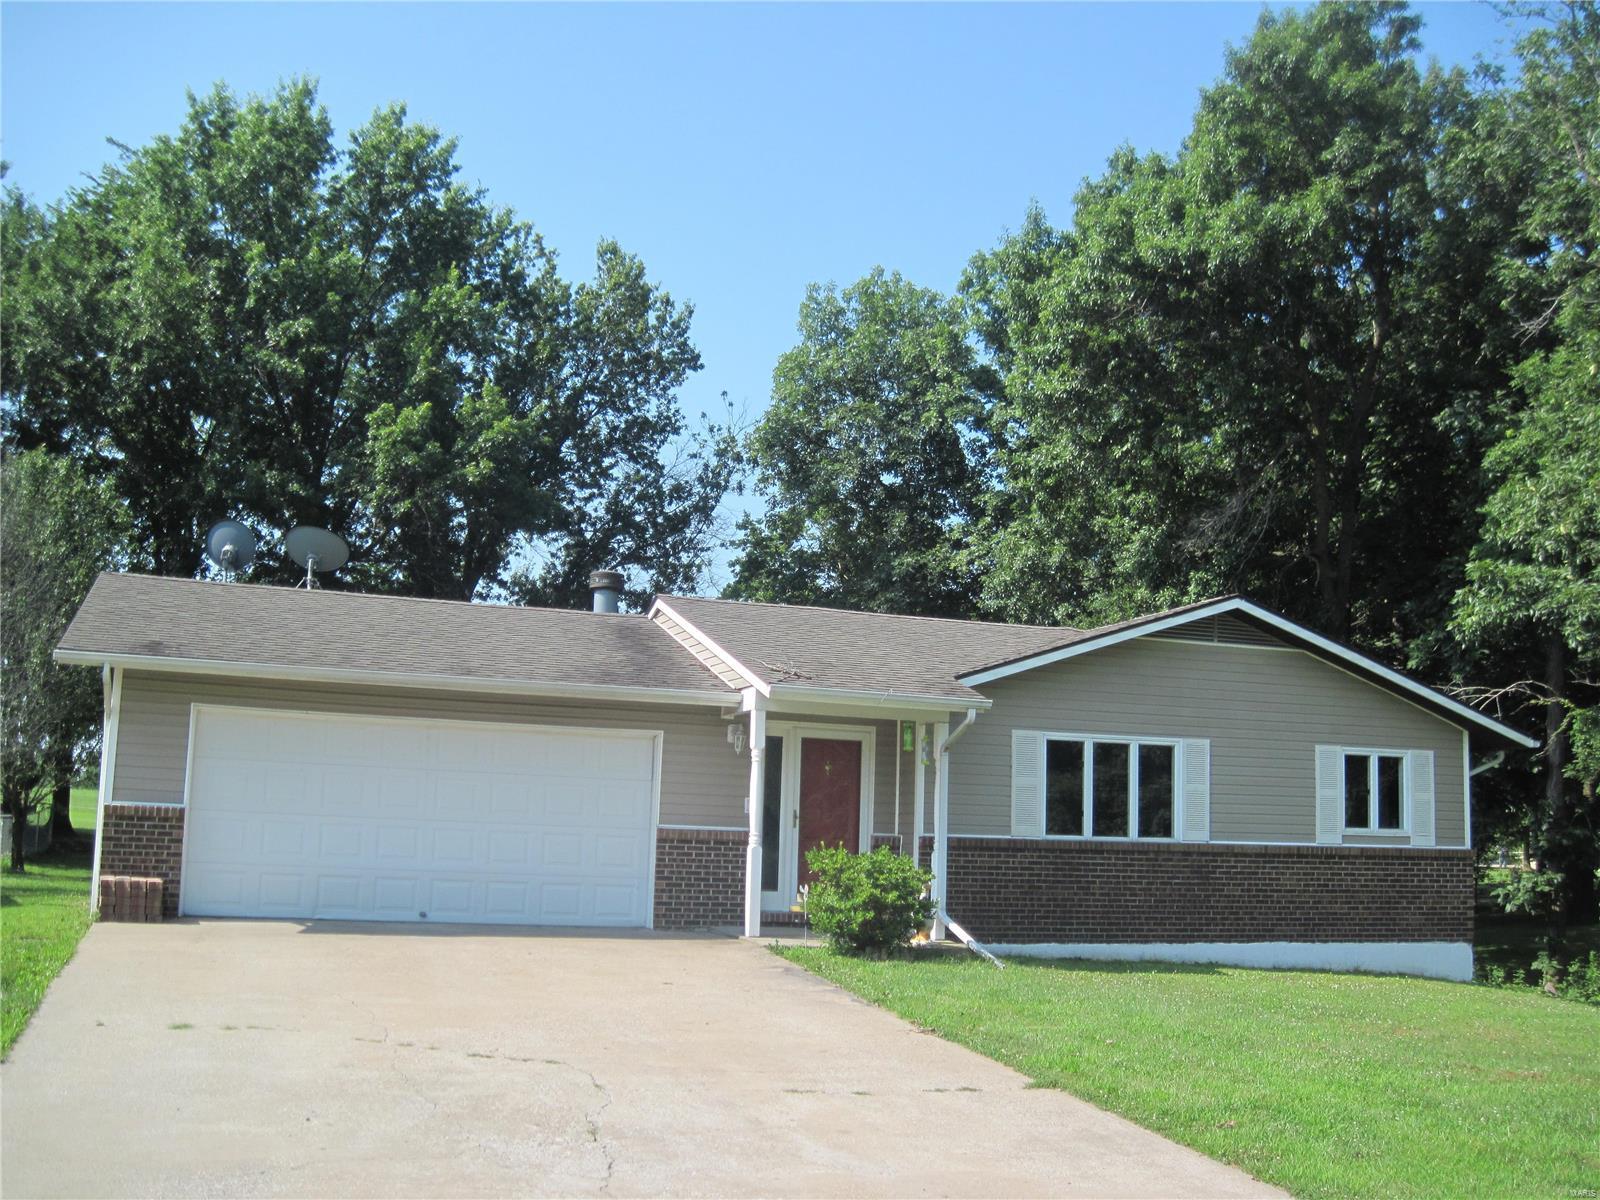 49249 E Lakeshore Drive Property Photo - Hannibal, MO real estate listing